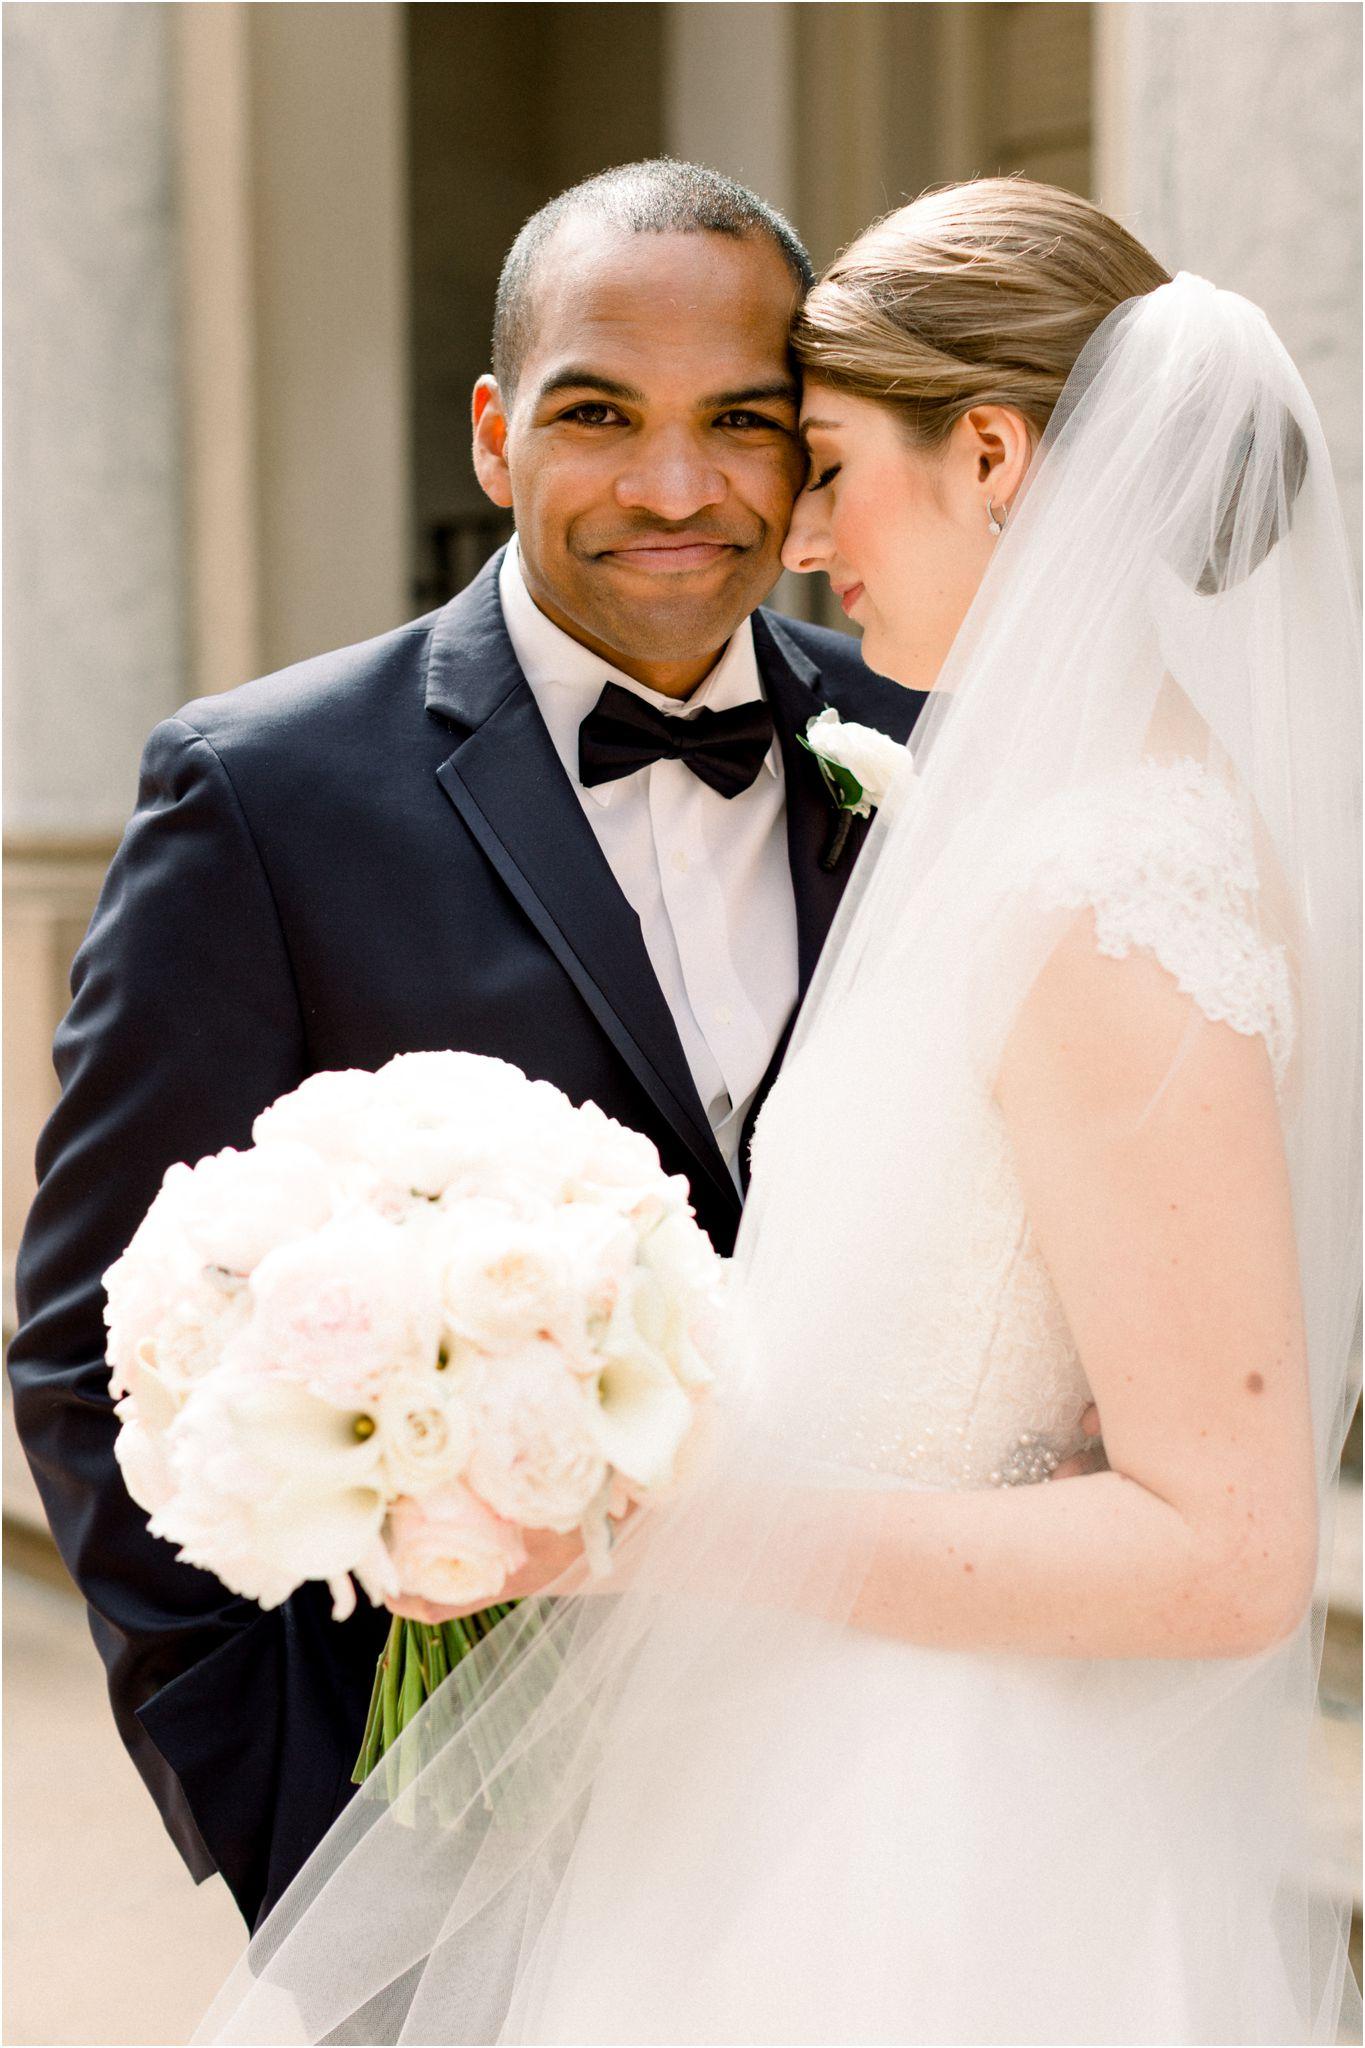 providence-public-library-wedding-images_00019.JPG